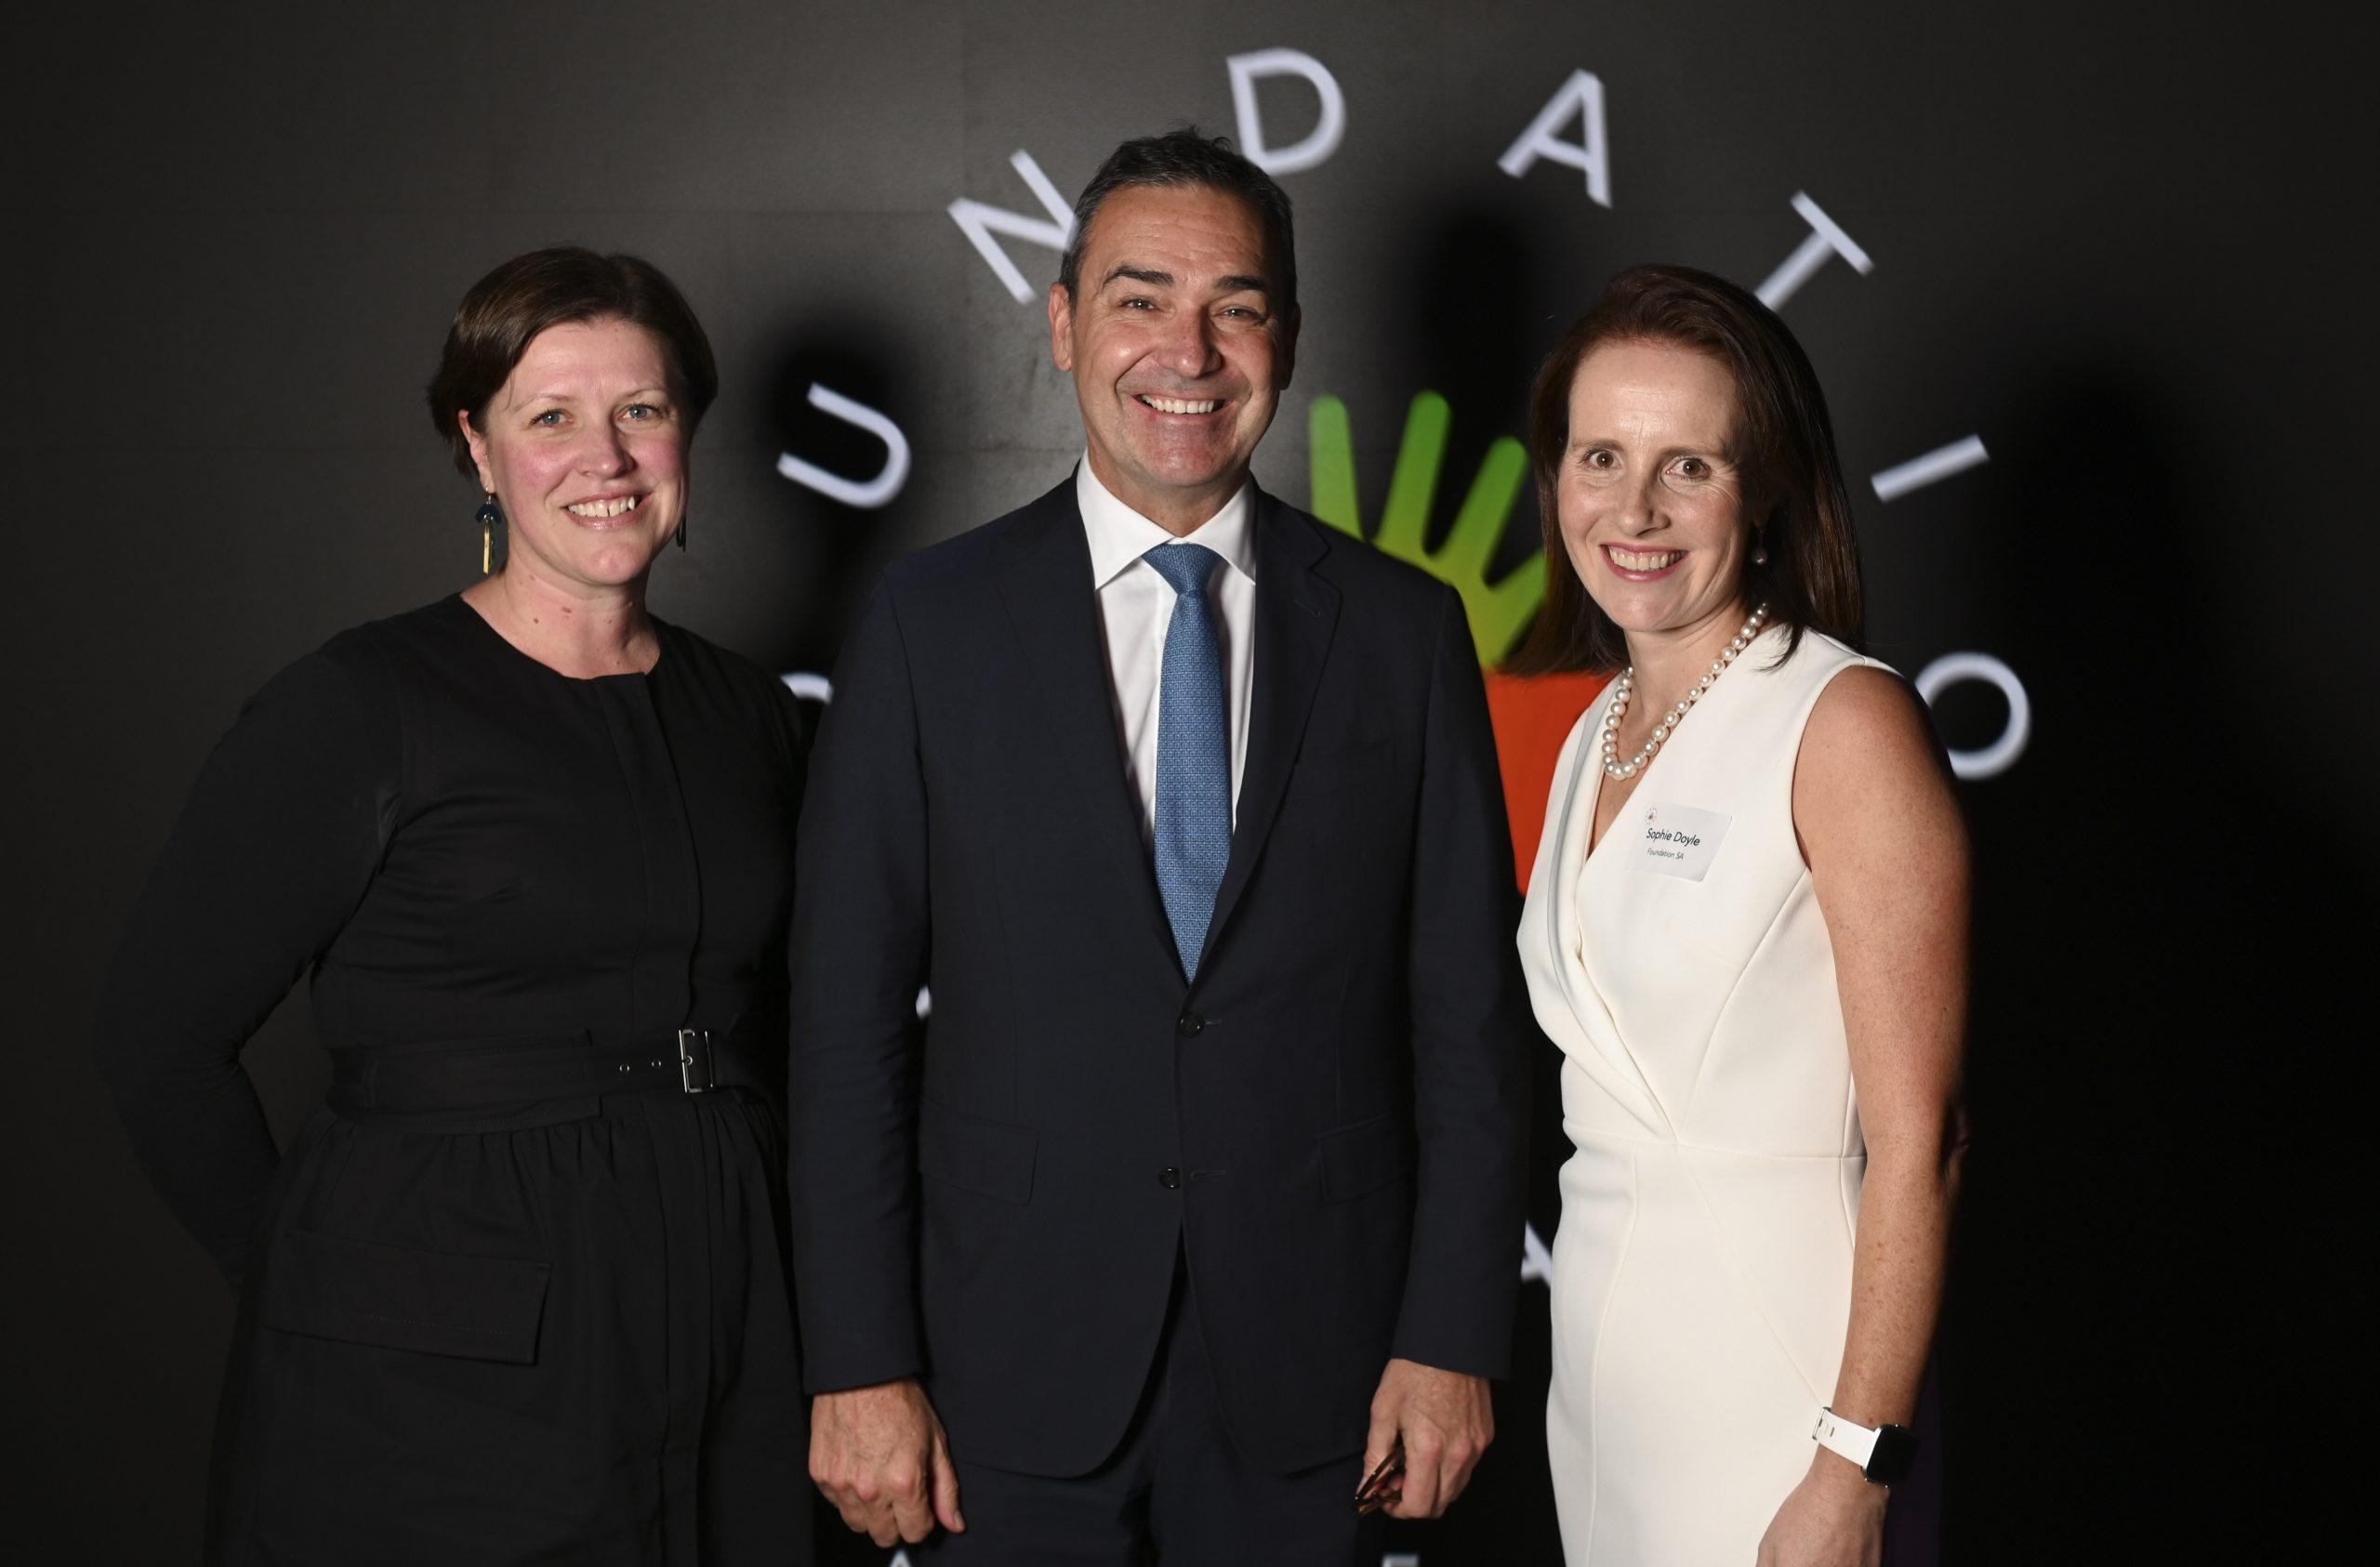 Celebrating a new era of philanthropic giving in South Australia